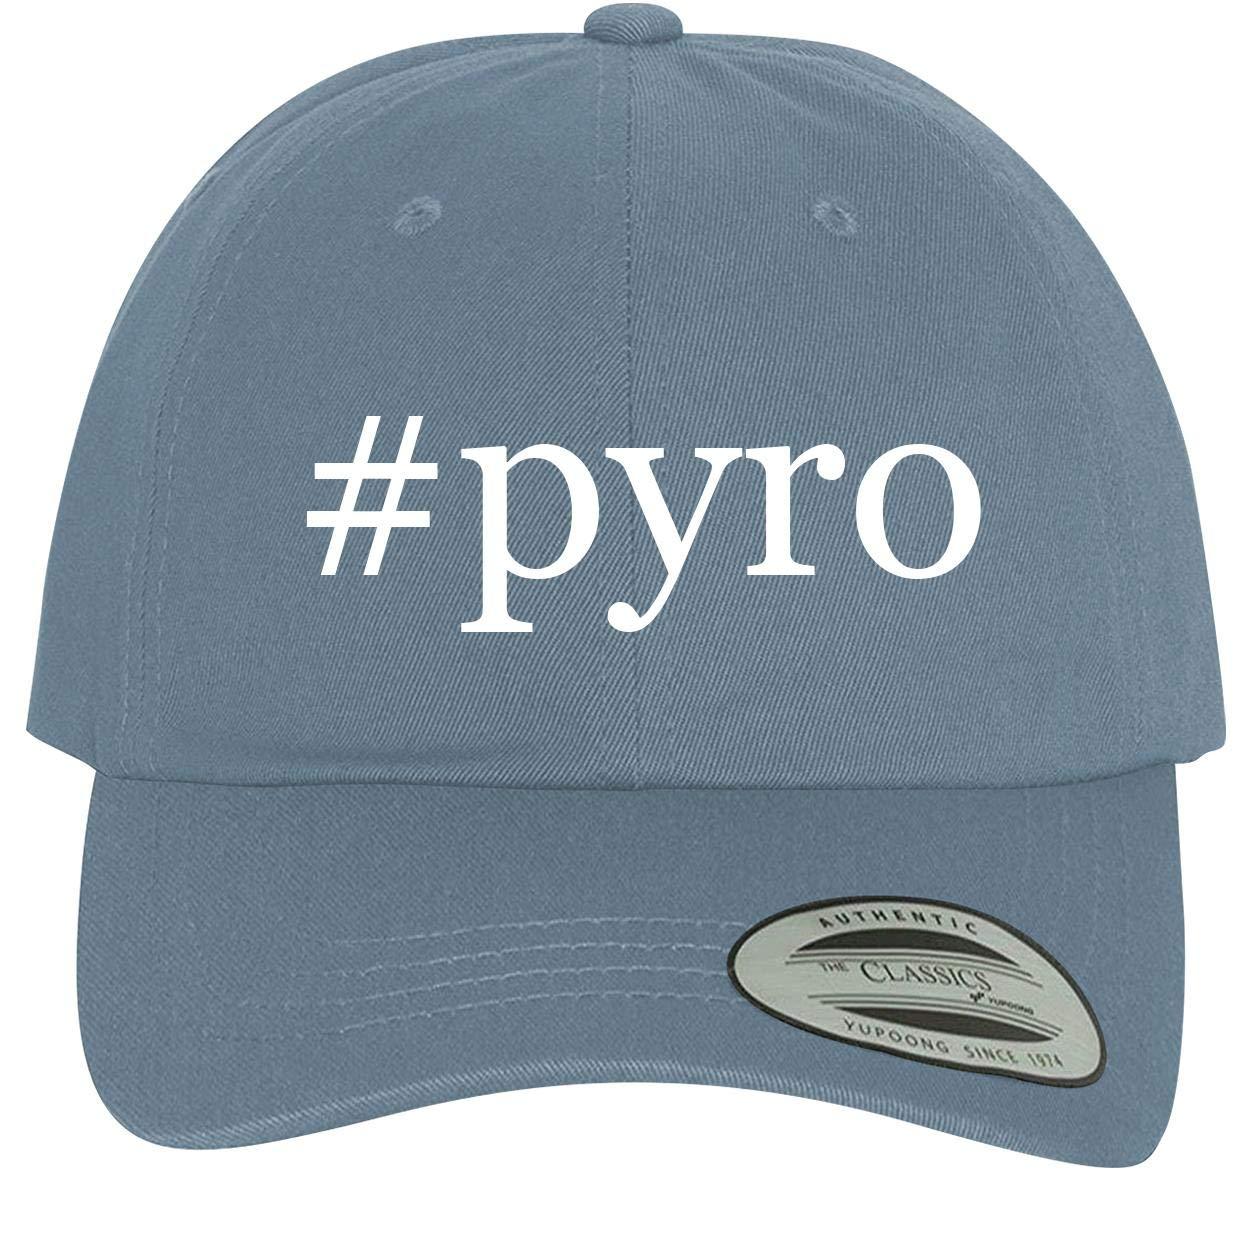 Comfortable Dad Hat Baseball Cap BH Cool Designs #pyro